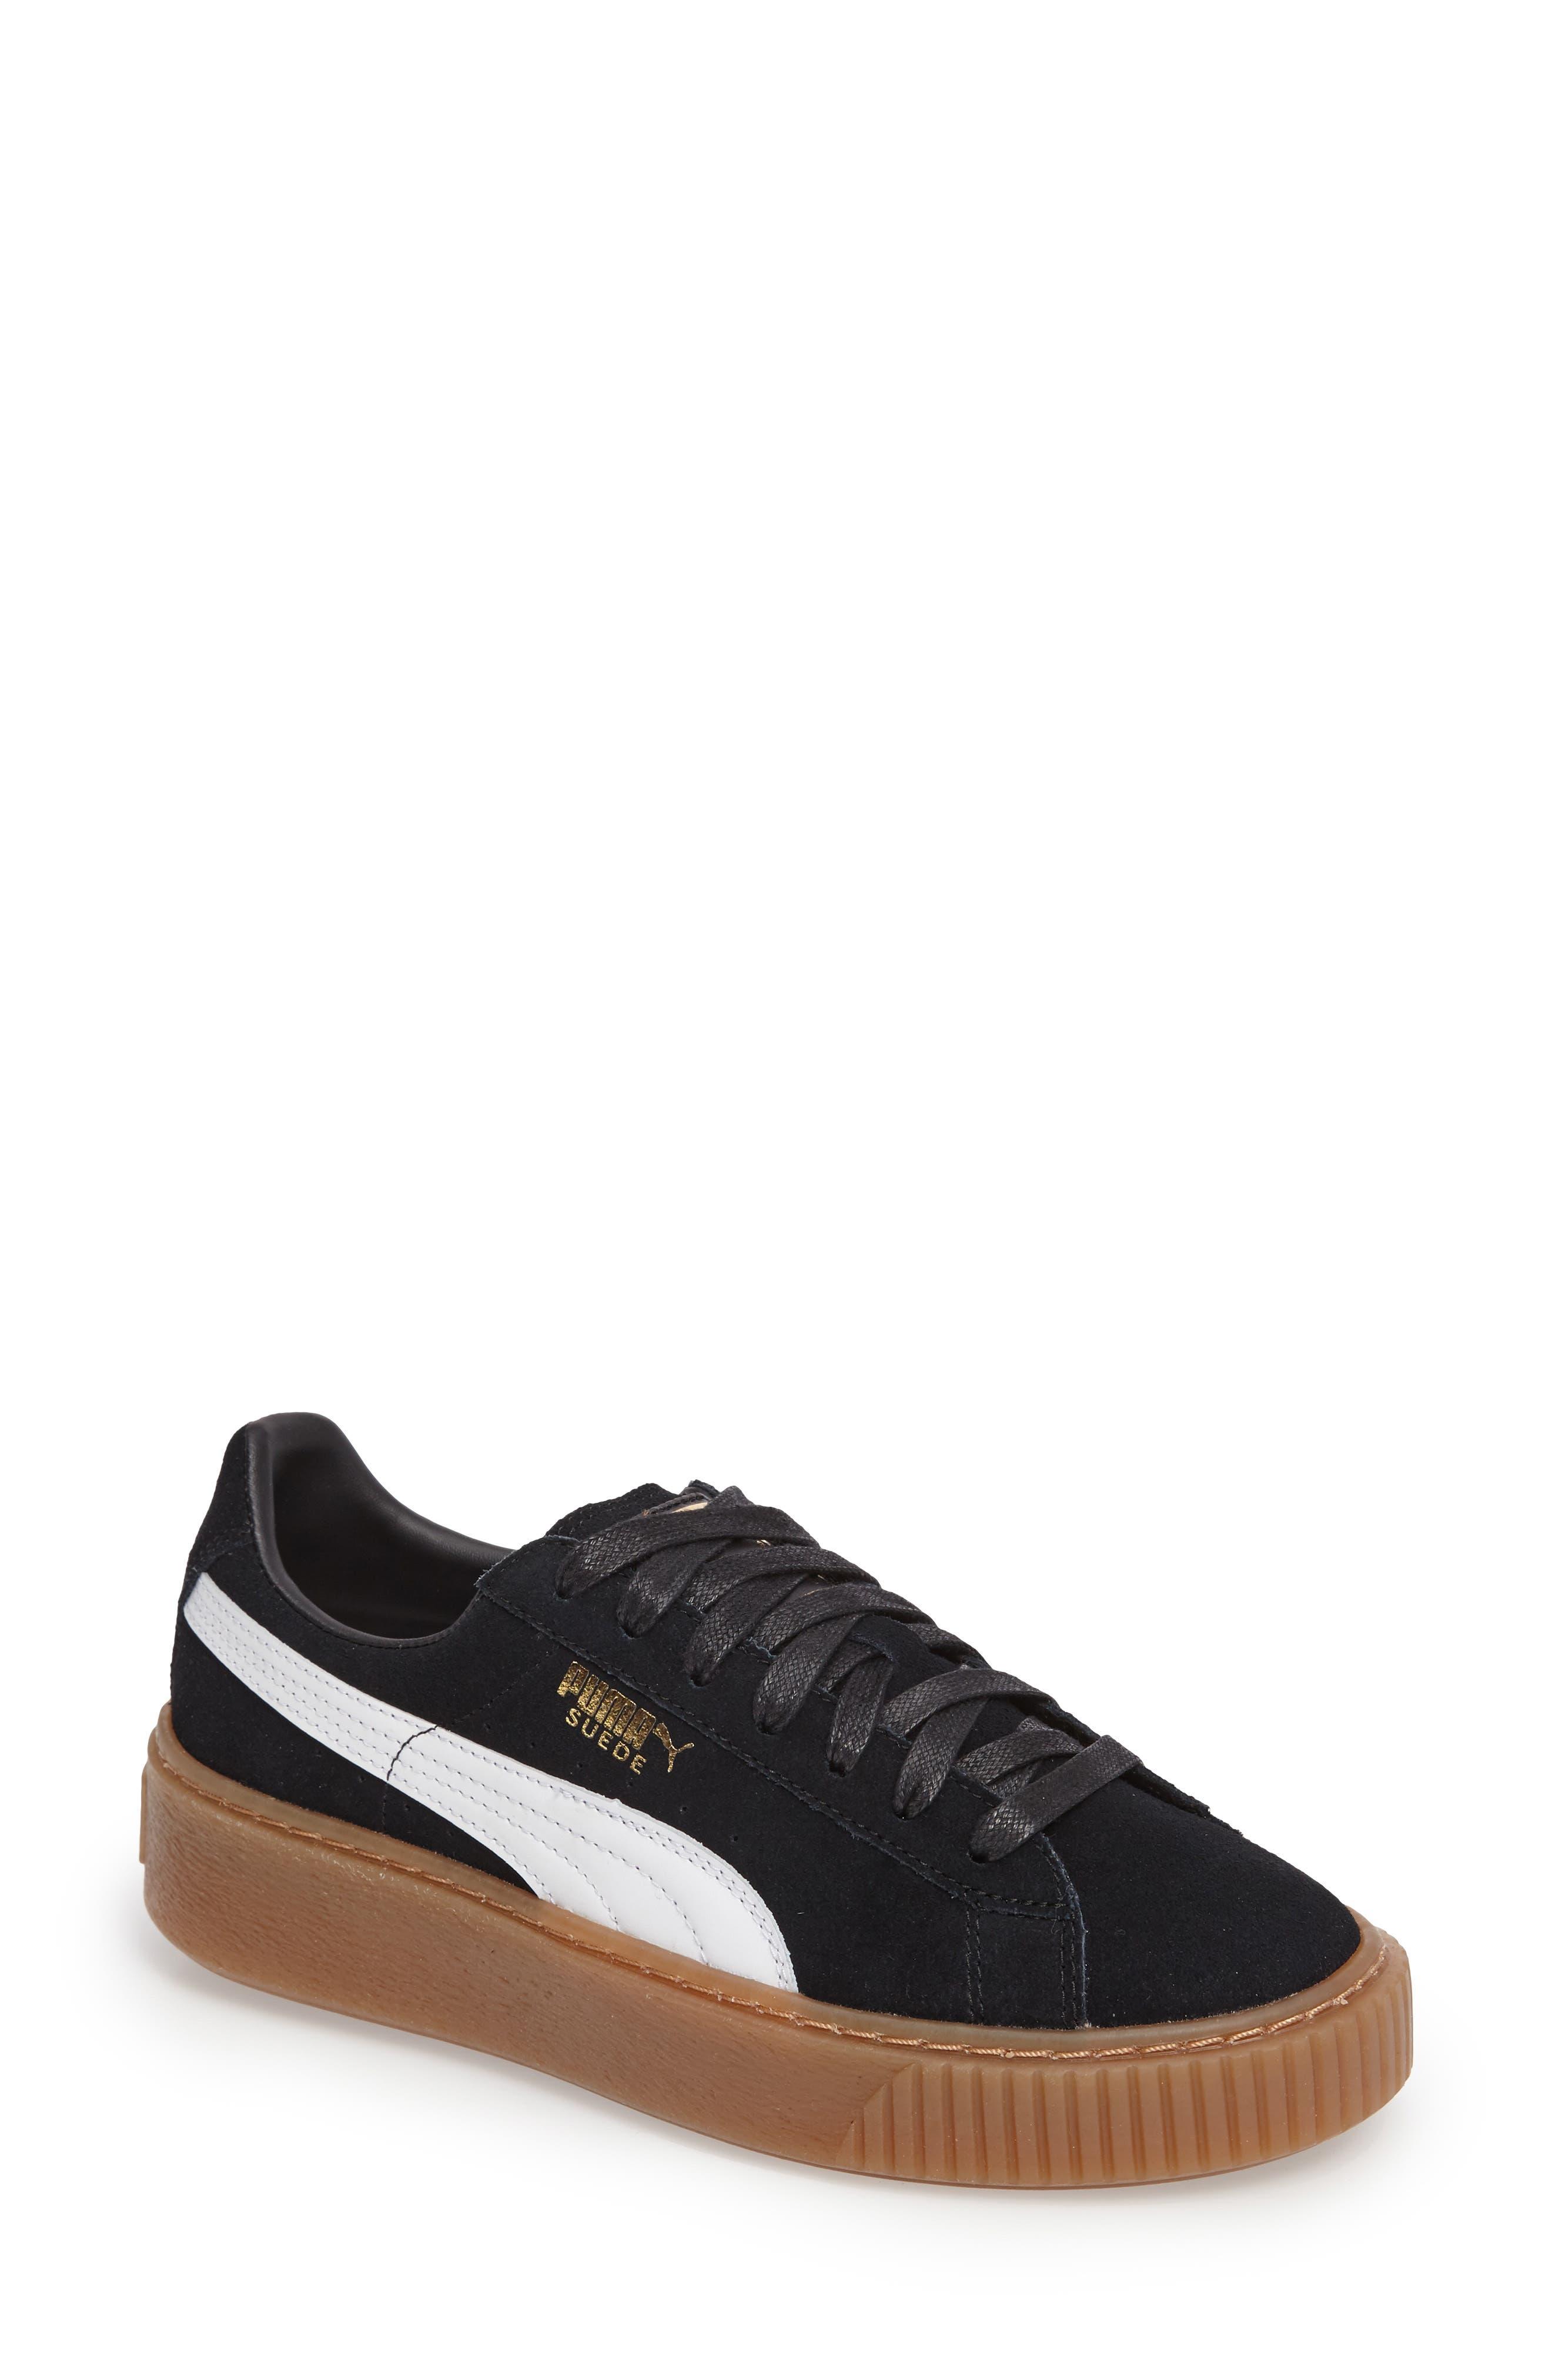 Main Image - PUMA Suede Platform Core Sneaker (Women)